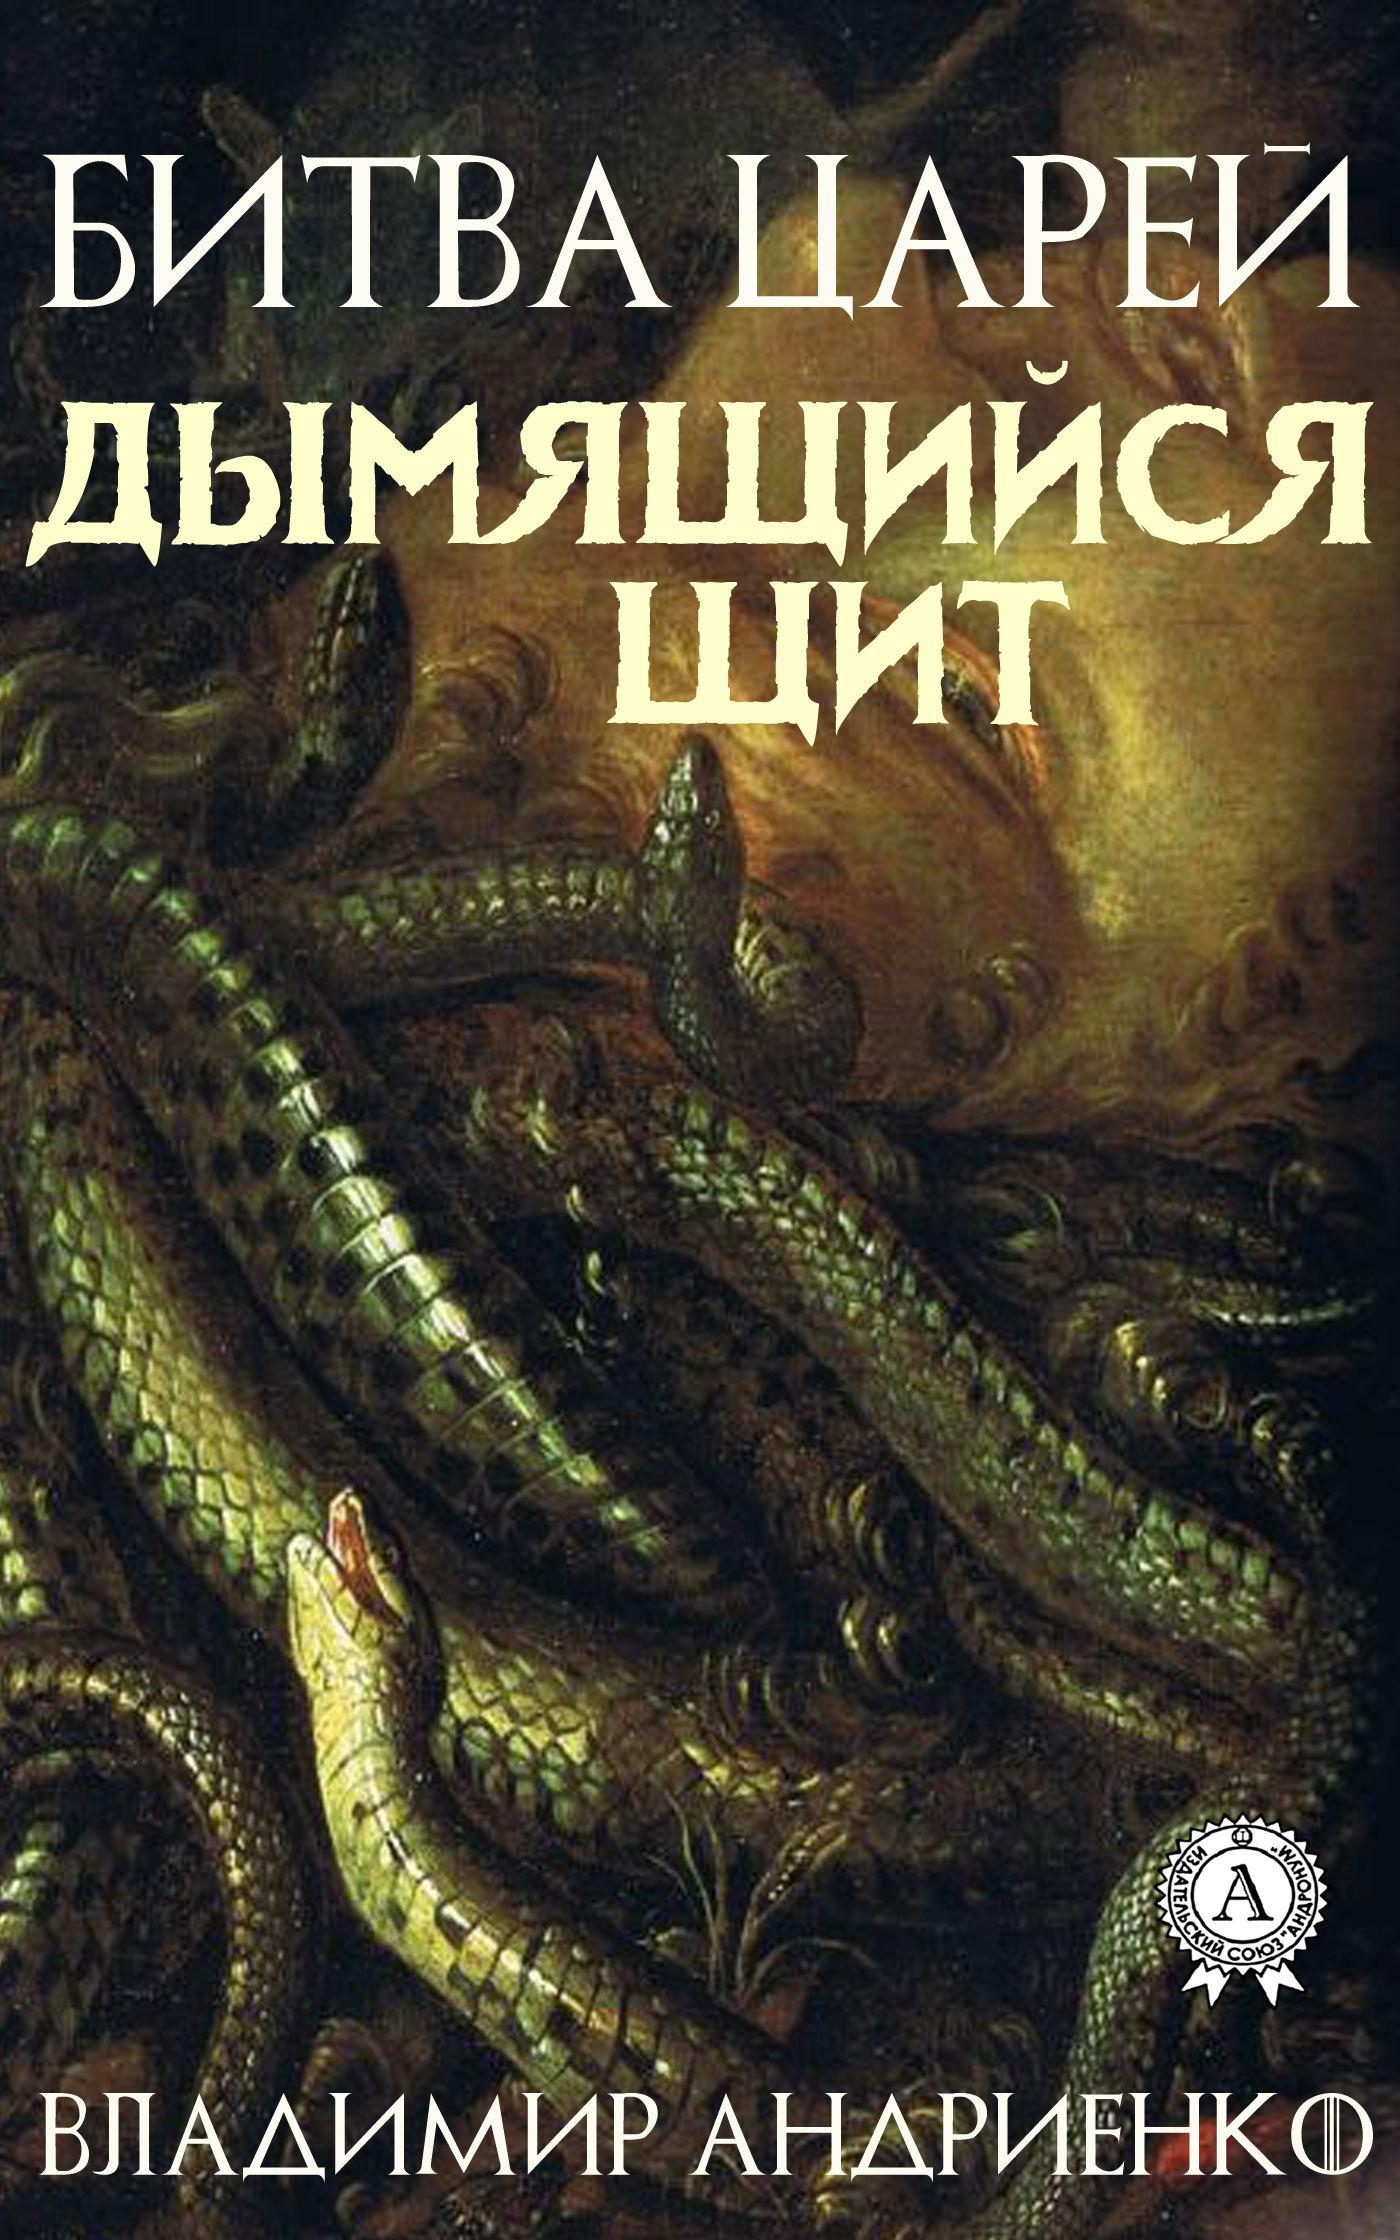 Владимир Андриенко Битва царей: Дымящийся щит